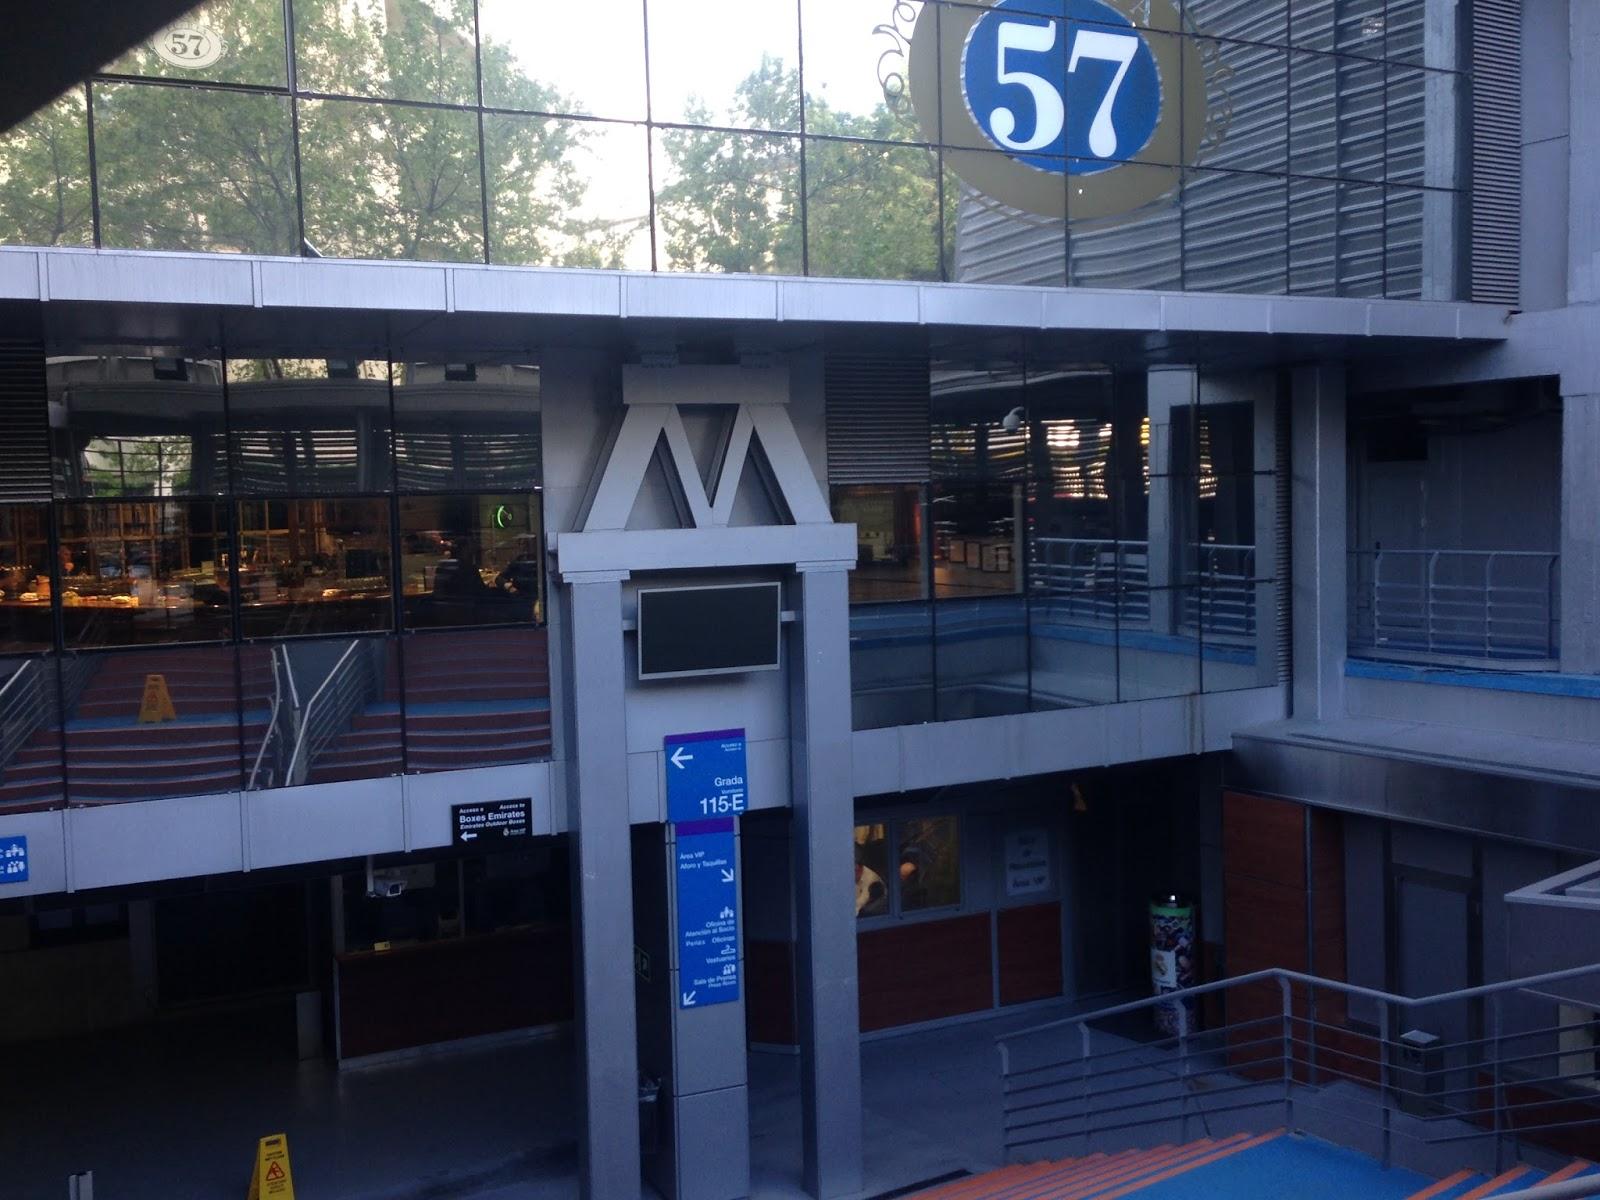 Puerta 57 madrid - Restaurante puerta 57 madrid ...